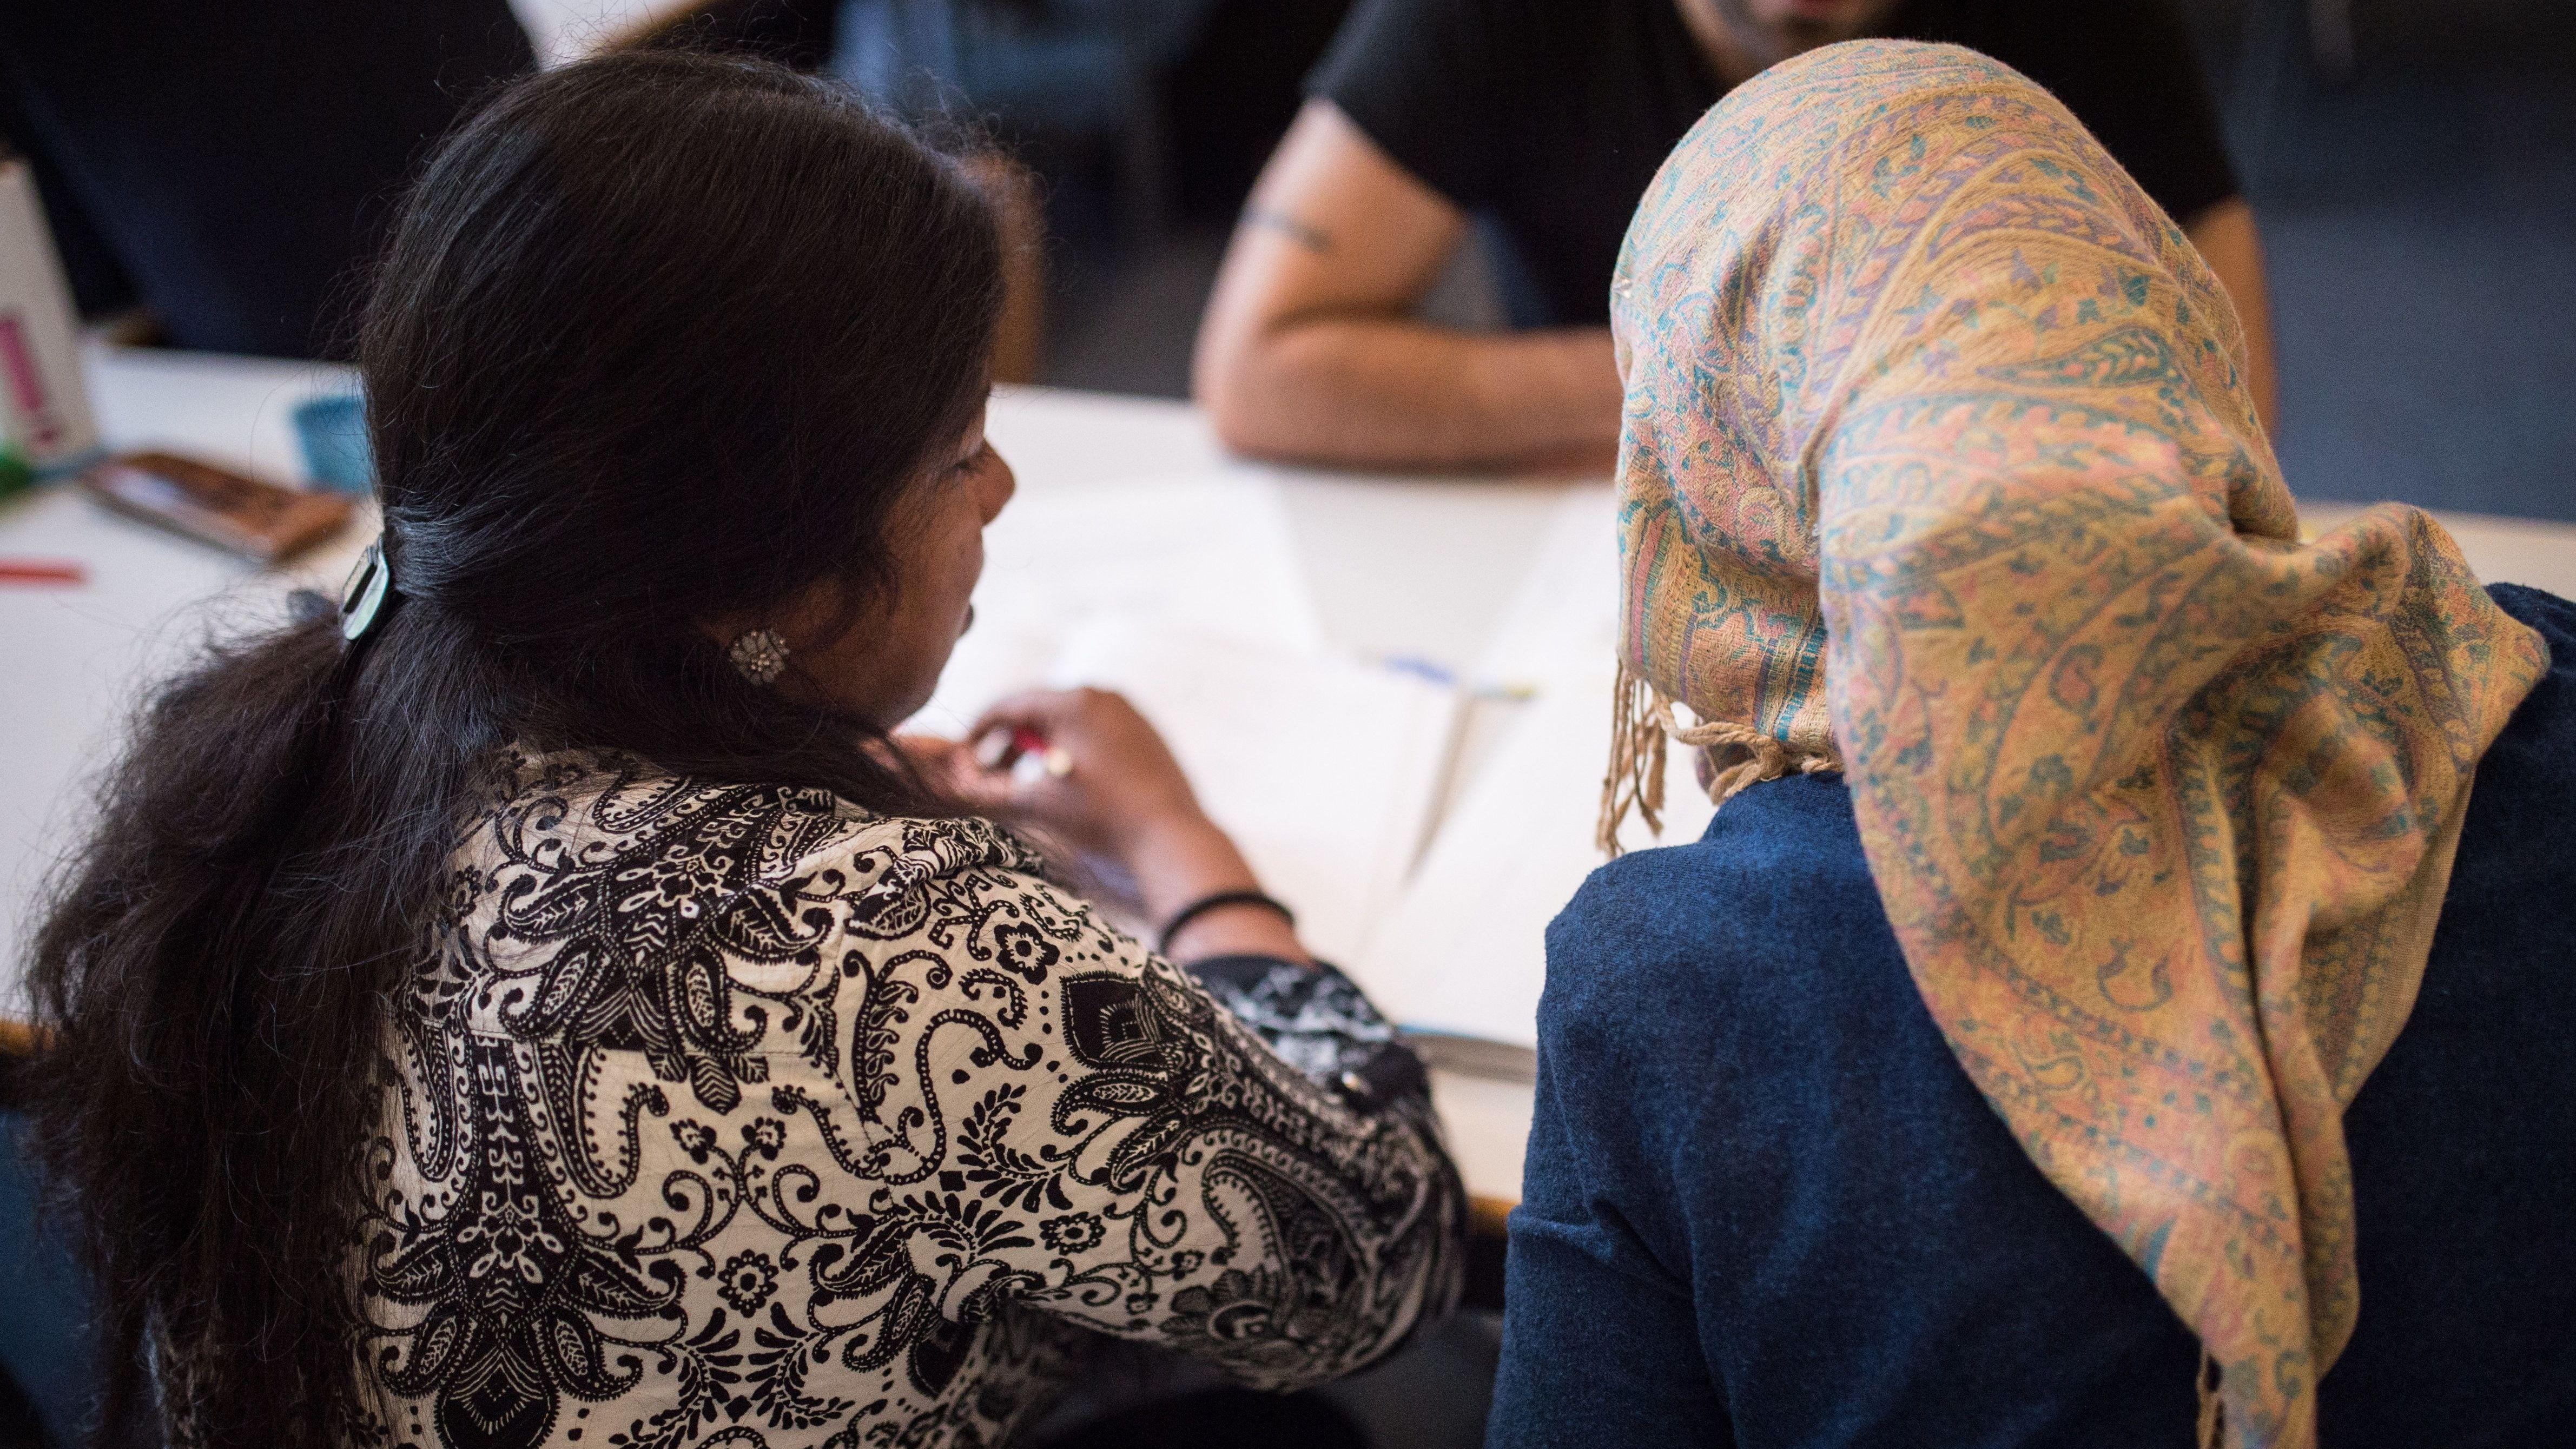 Geflüchtete Frauen nehmen am Integrationskurs teil